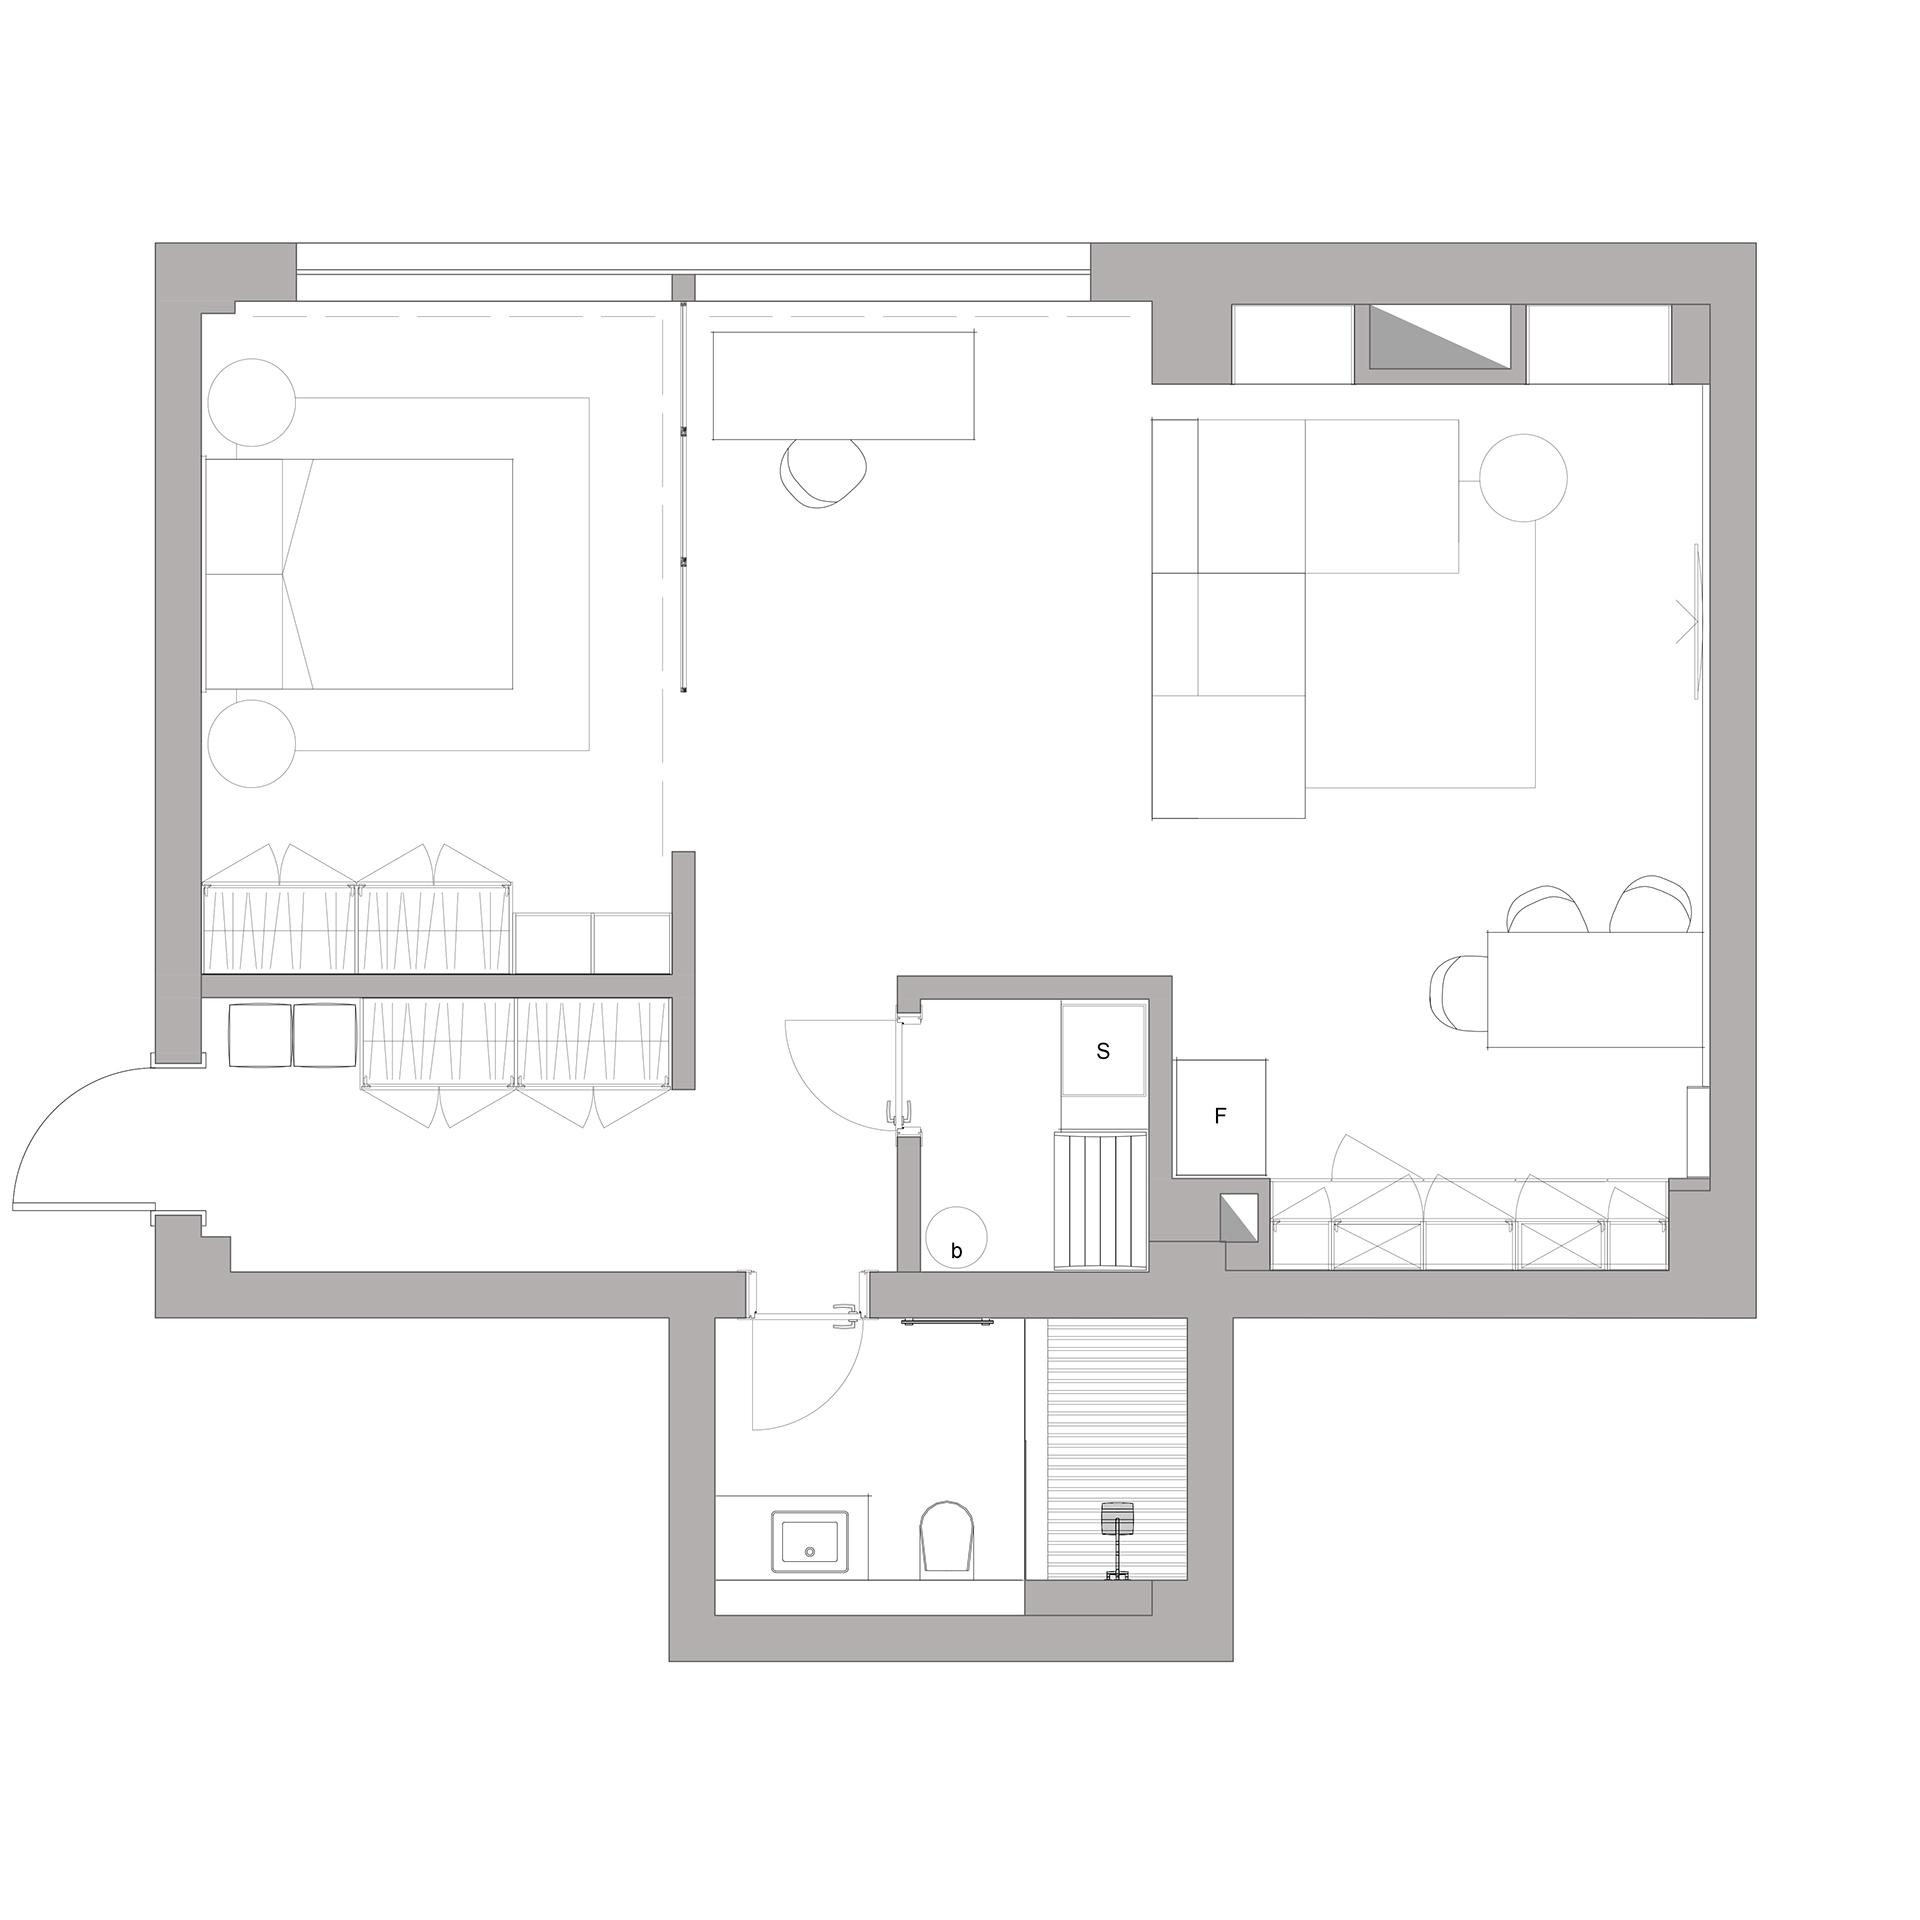 750 Sq Ft Apartment: 3 Modern Home Interiors Under 70 Square Metres (750 Square